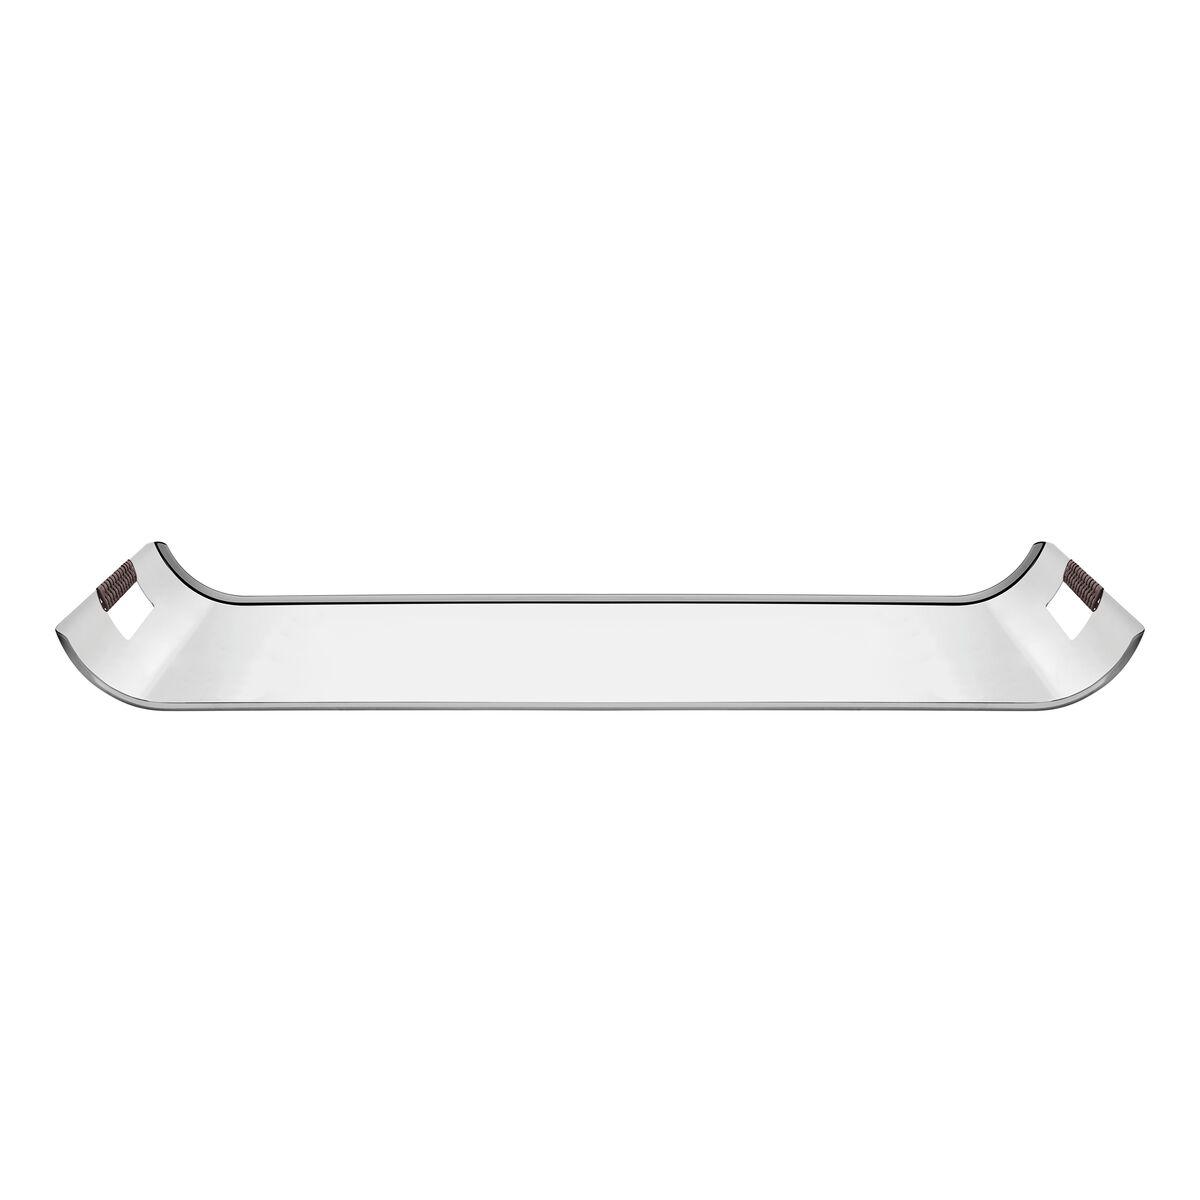 Tramontina Quadrata 51x36 cm rectangular stainless steel tray with polyethylene handles